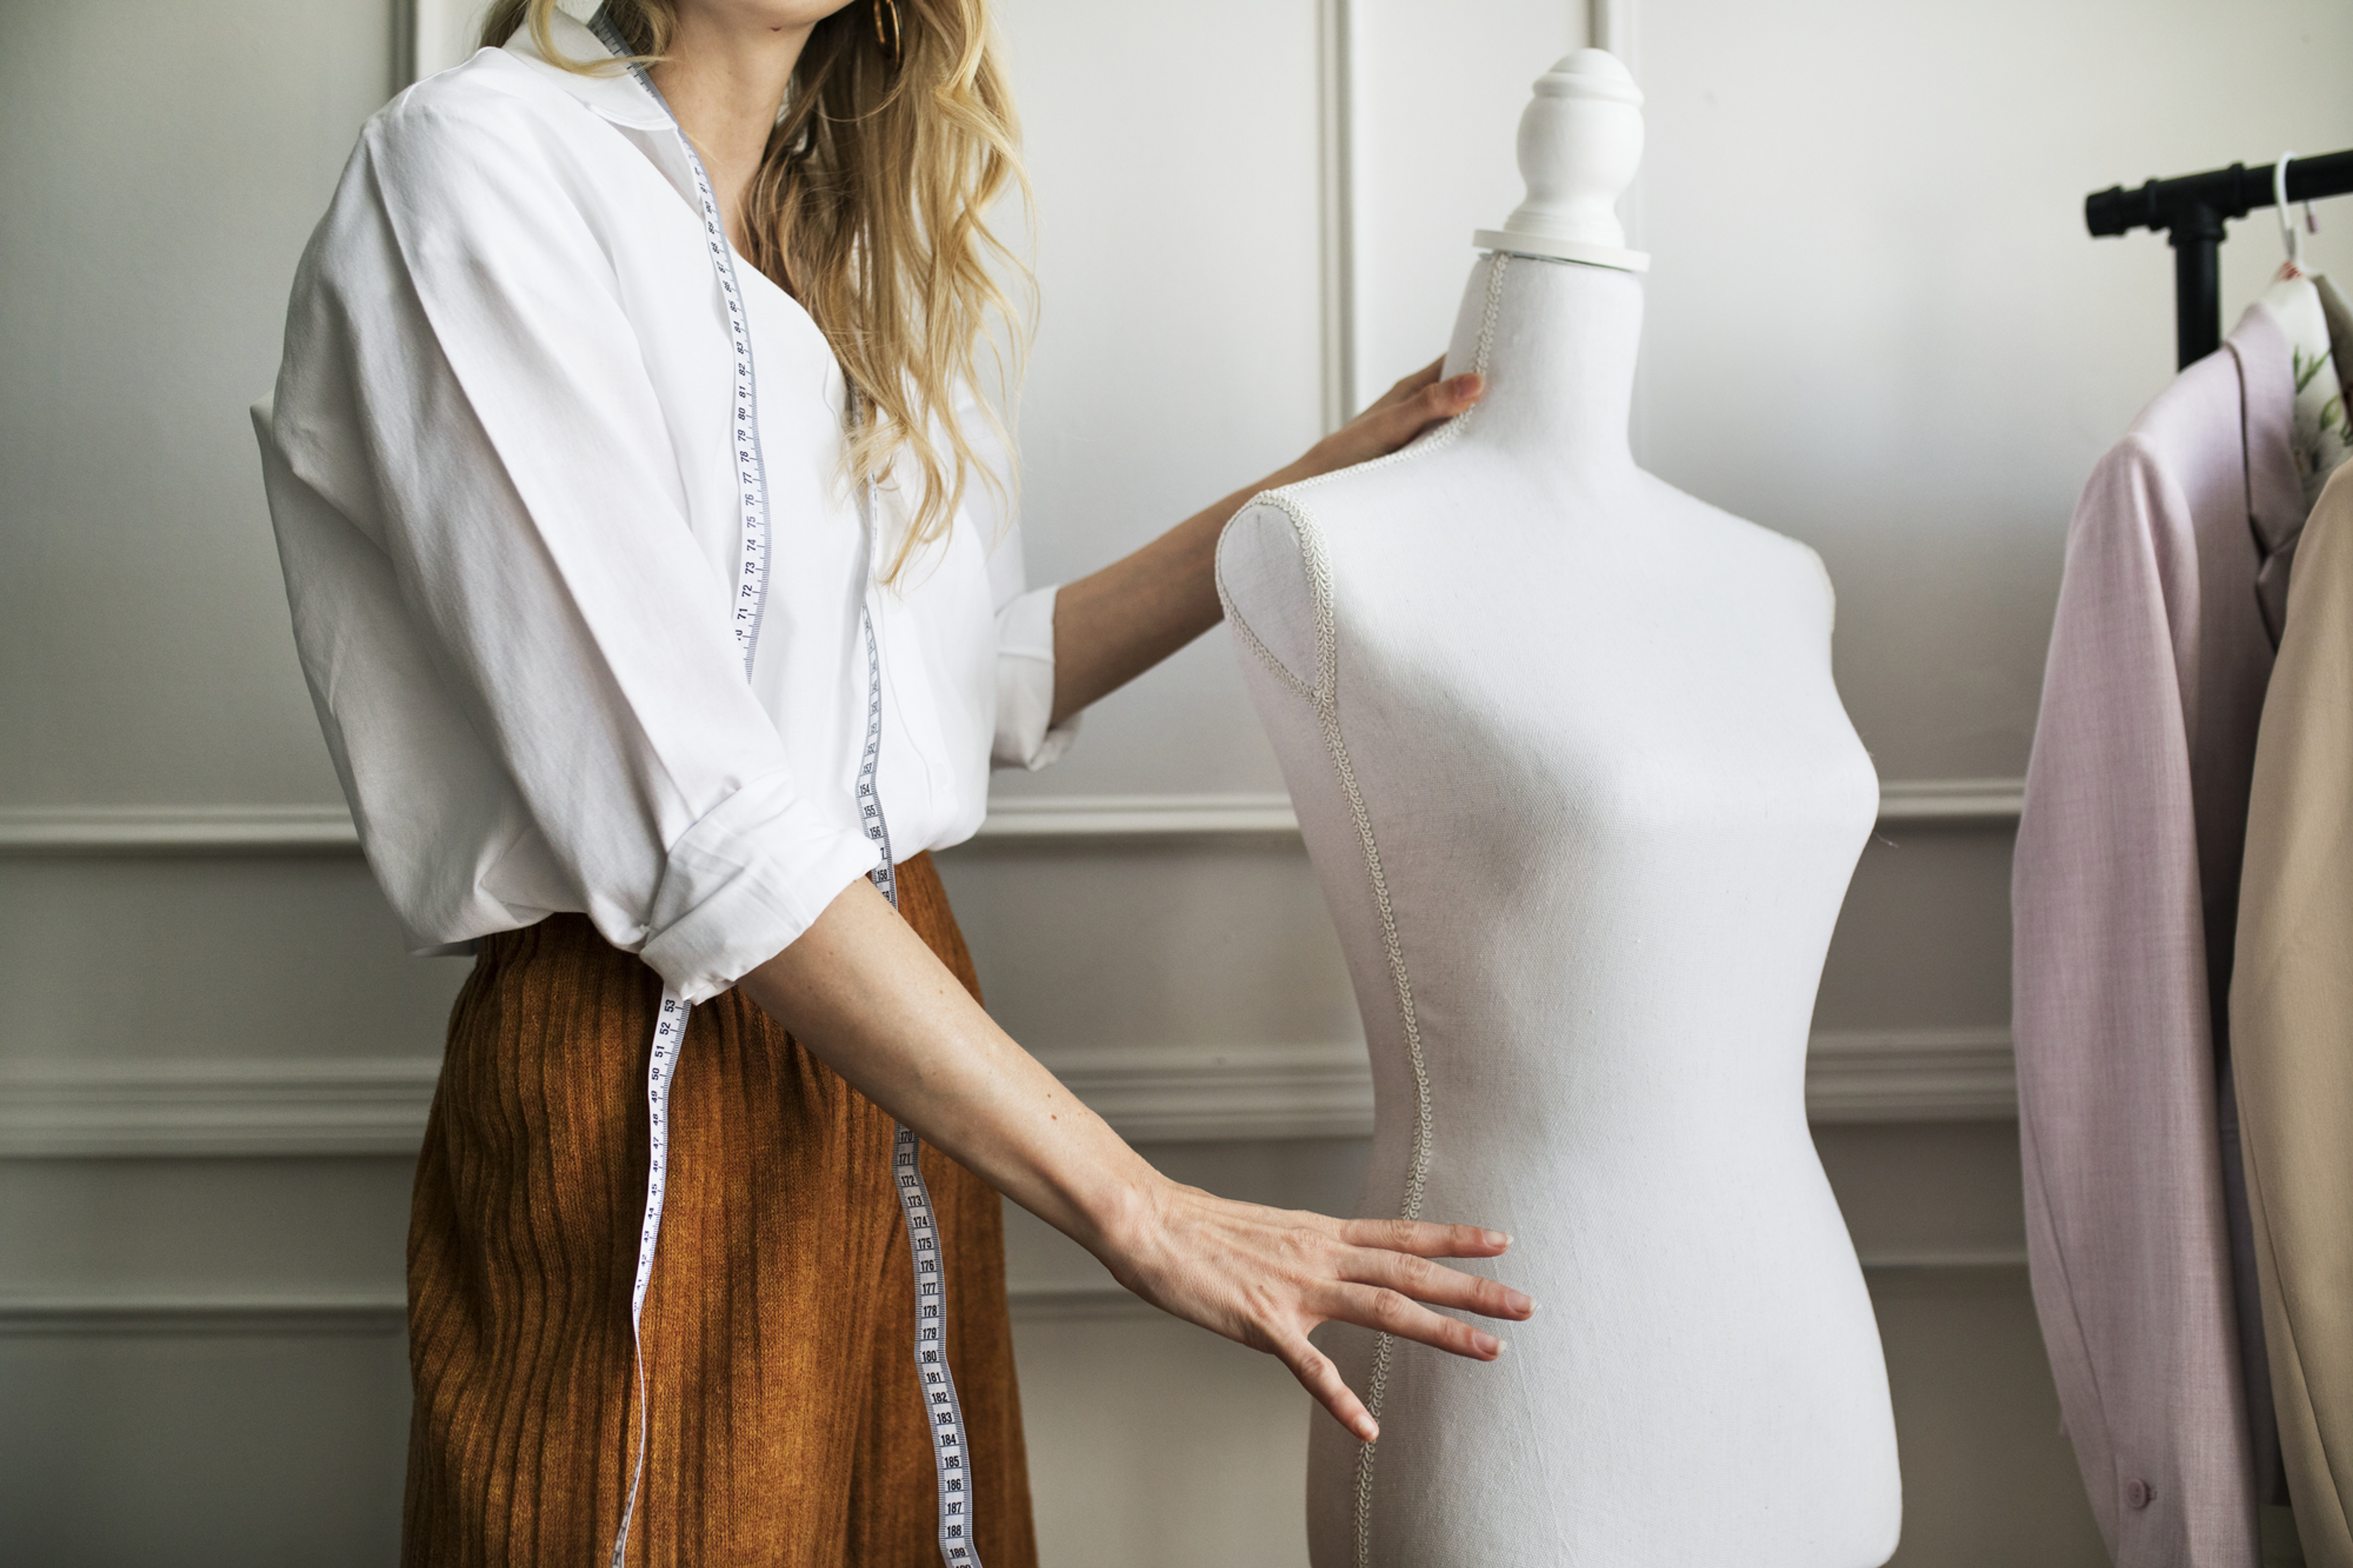 Bridesmaid Dress Fitting